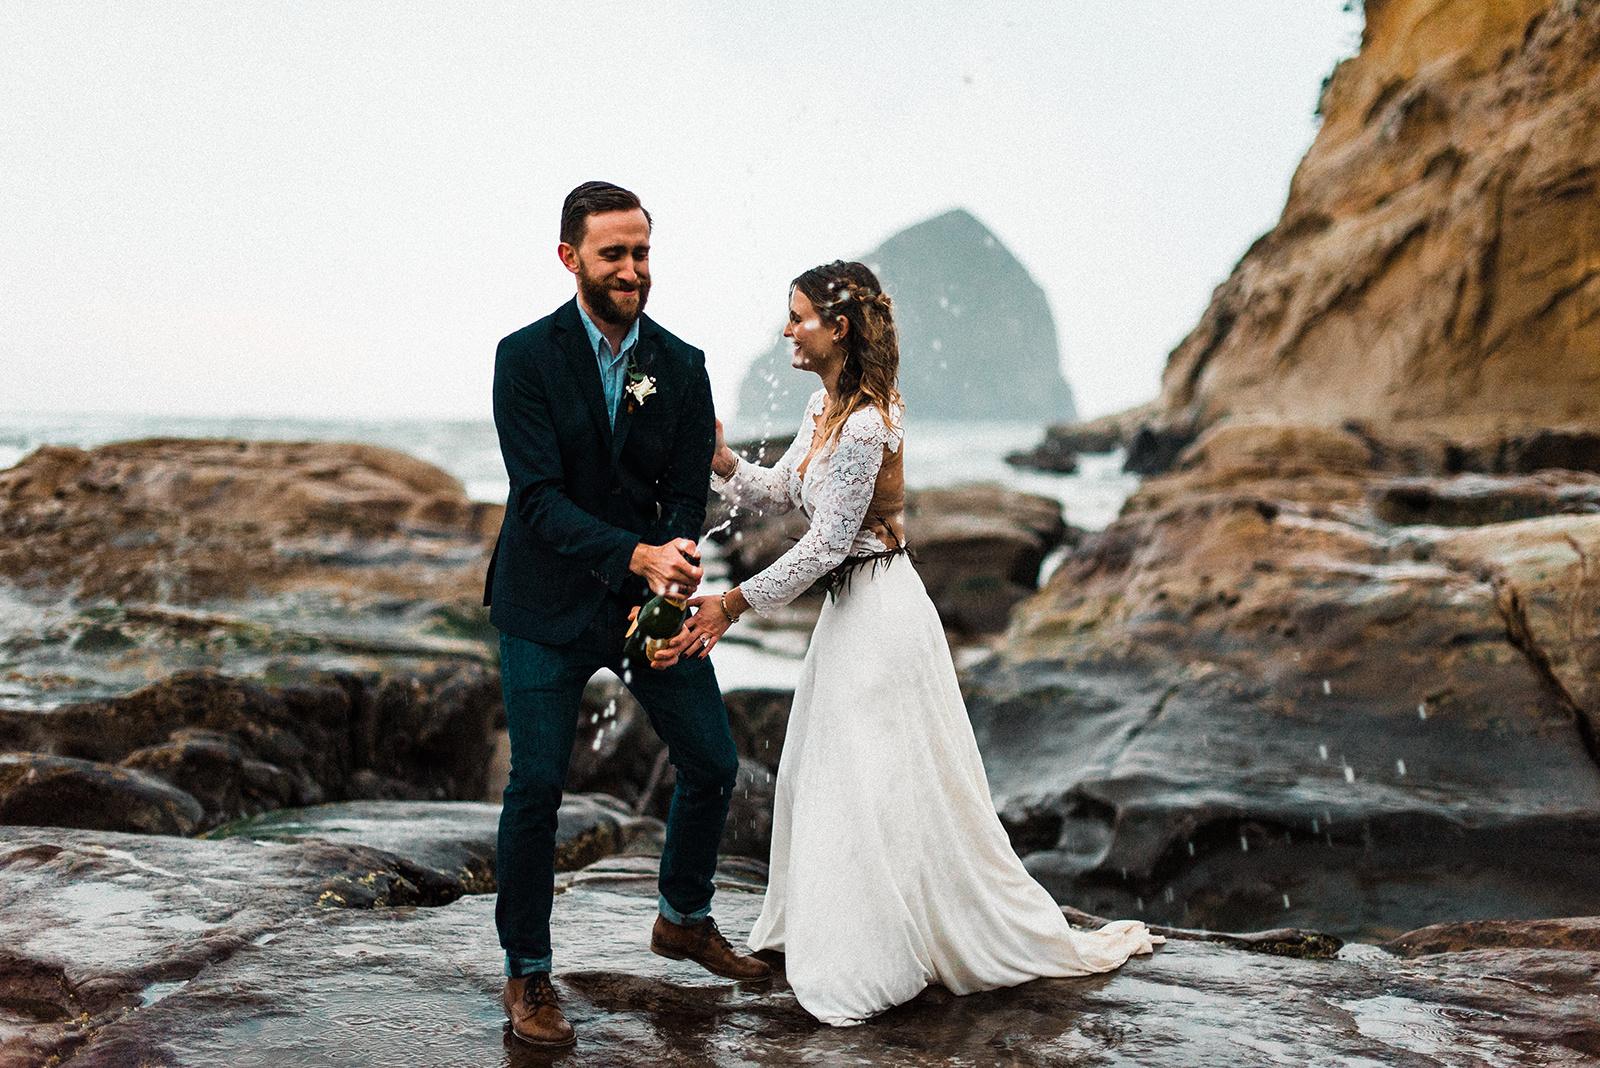 Oregon_Coast_Elopement_Wedding_The_Foxes_Photography_166-2.jpg